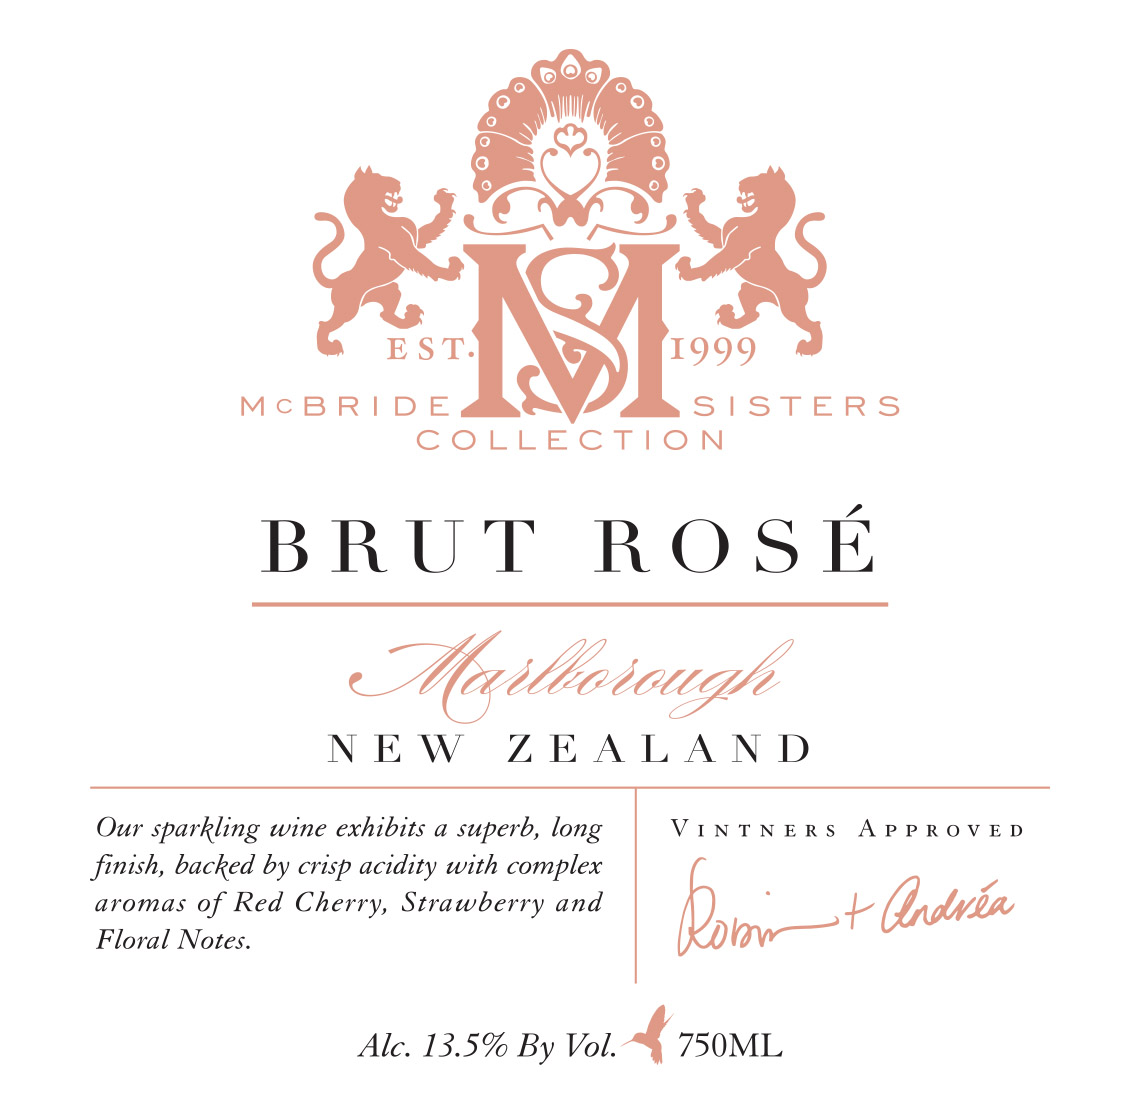 McBrideSisters-Brut-Rose-Front-label-3.8in-X-3.6614in.jpg